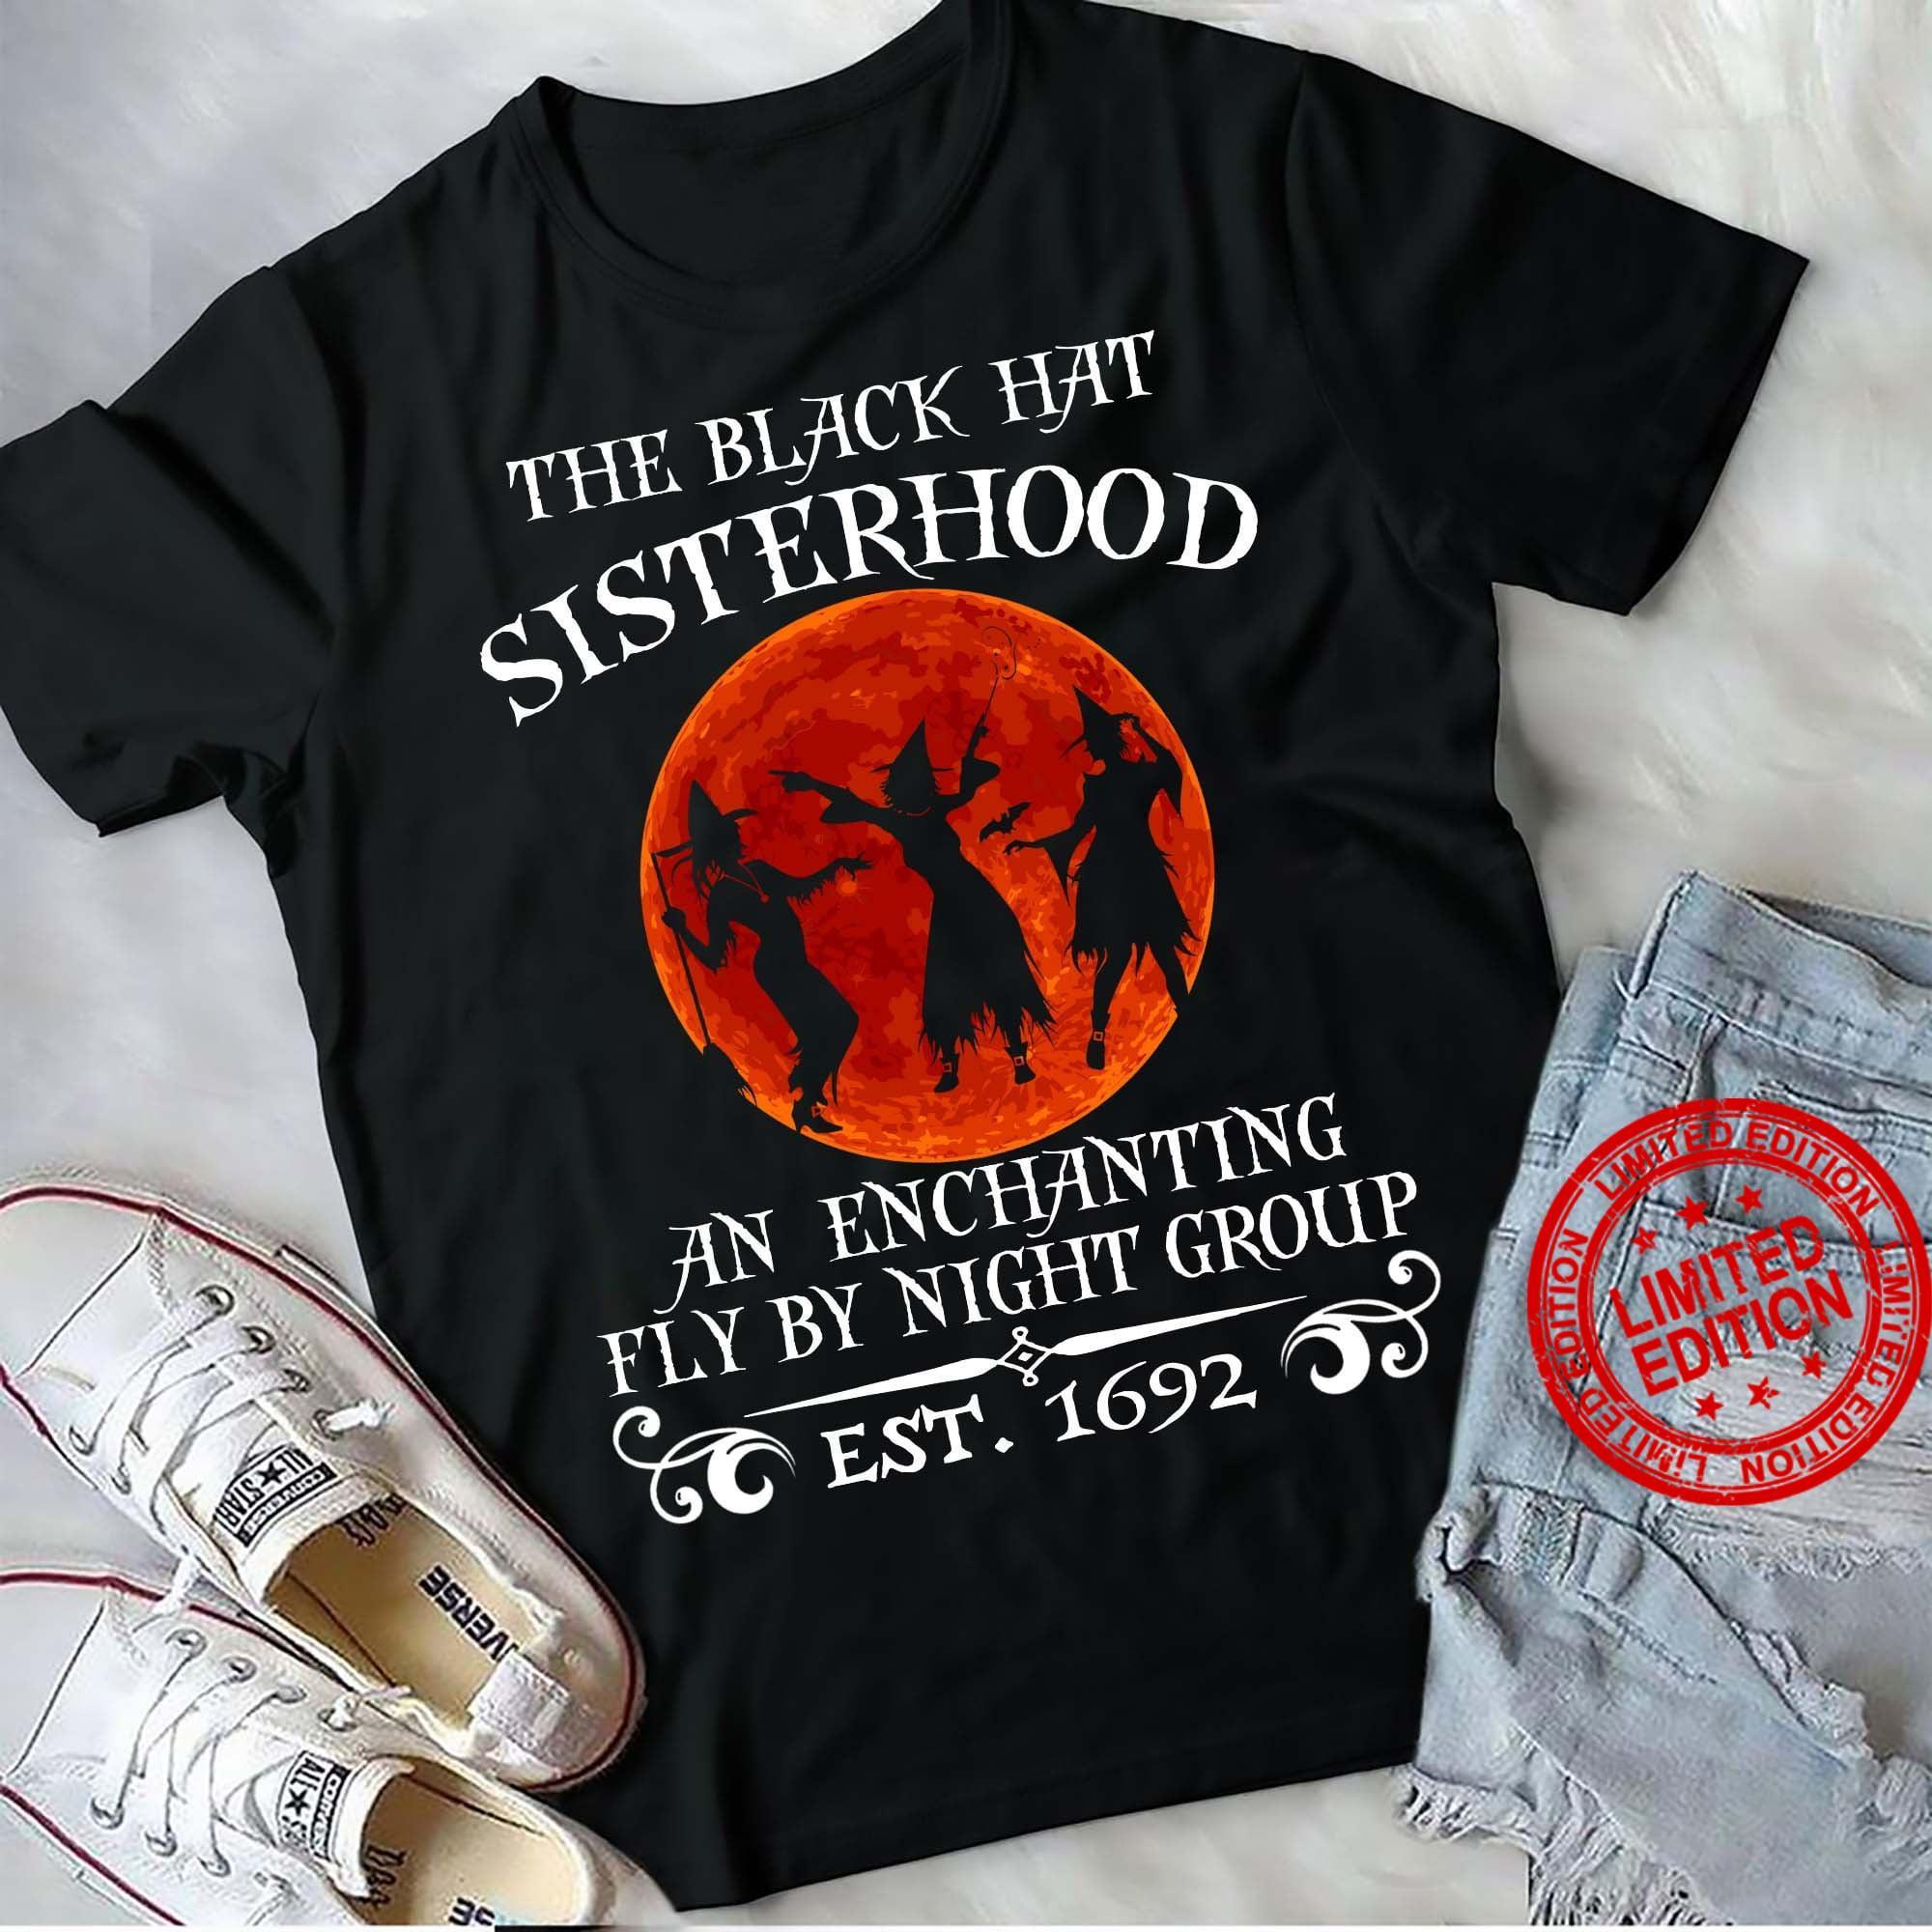 The Black Hat Sisterhood An Enchanting Fly By Night Group Est 1962 Shirt